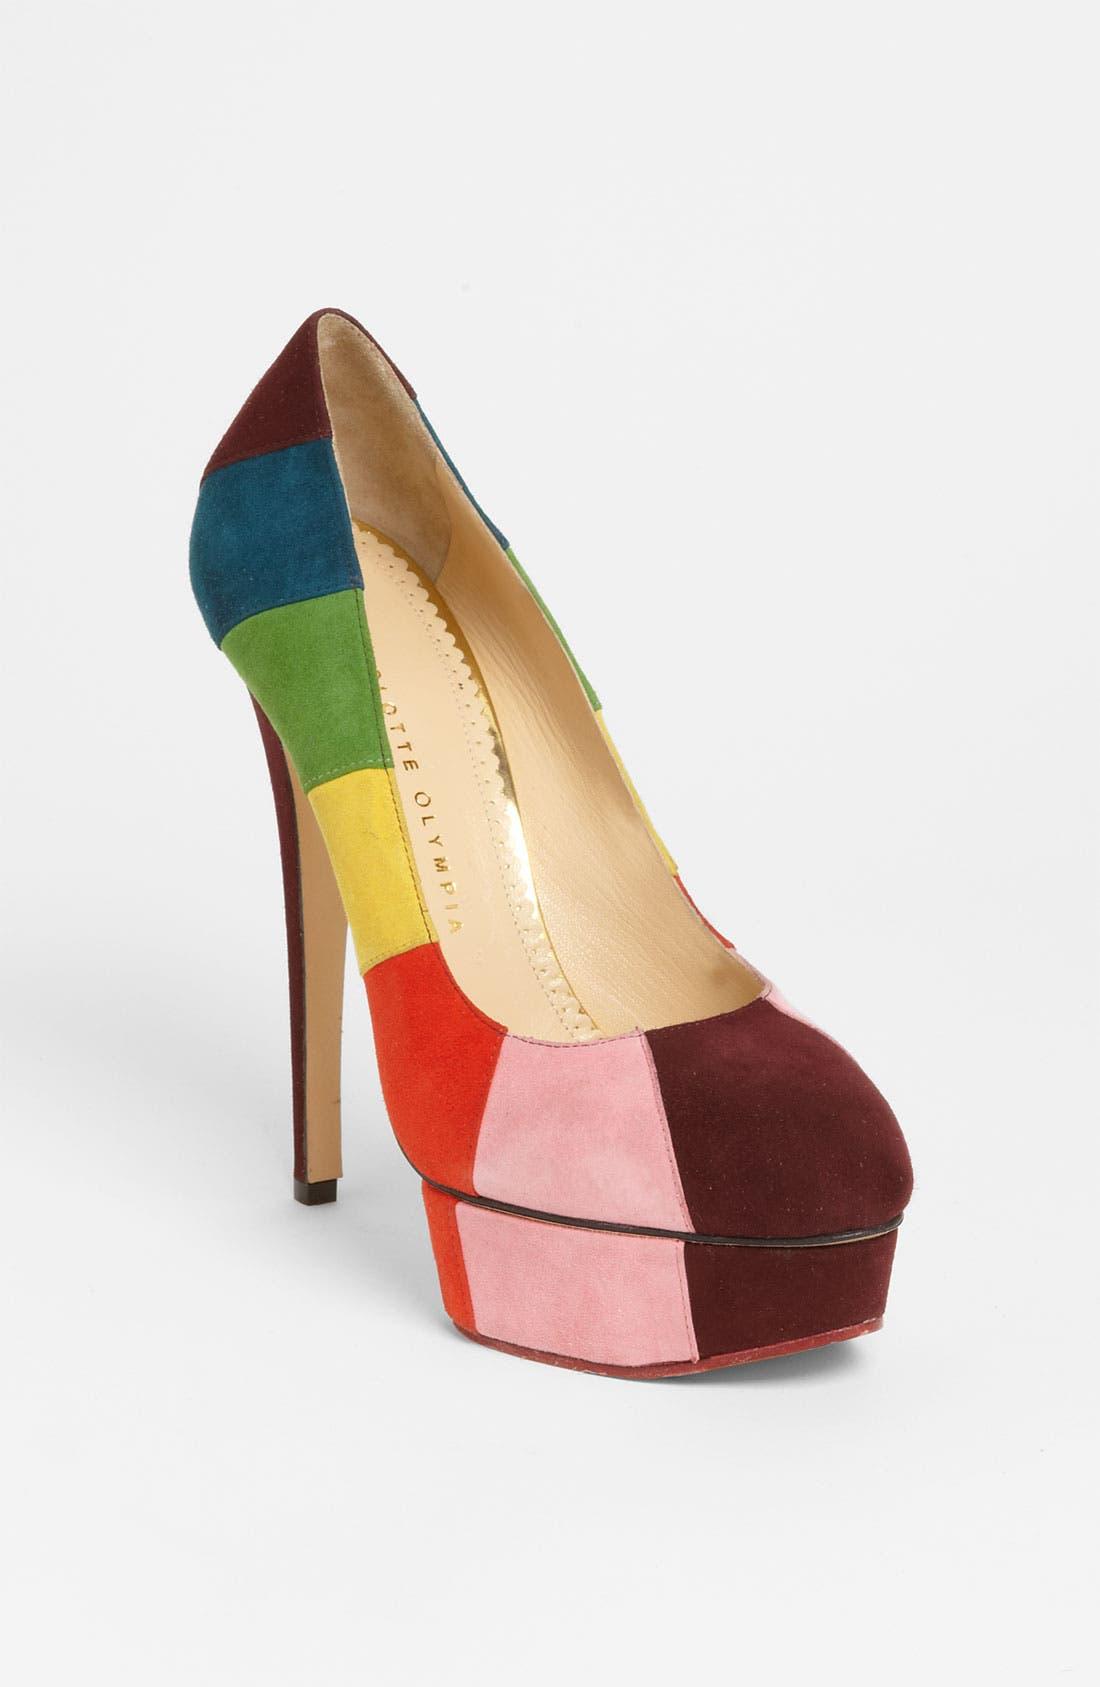 Alternate Image 1 Selected - Charlotte Olympia 'Rainbow' Pump